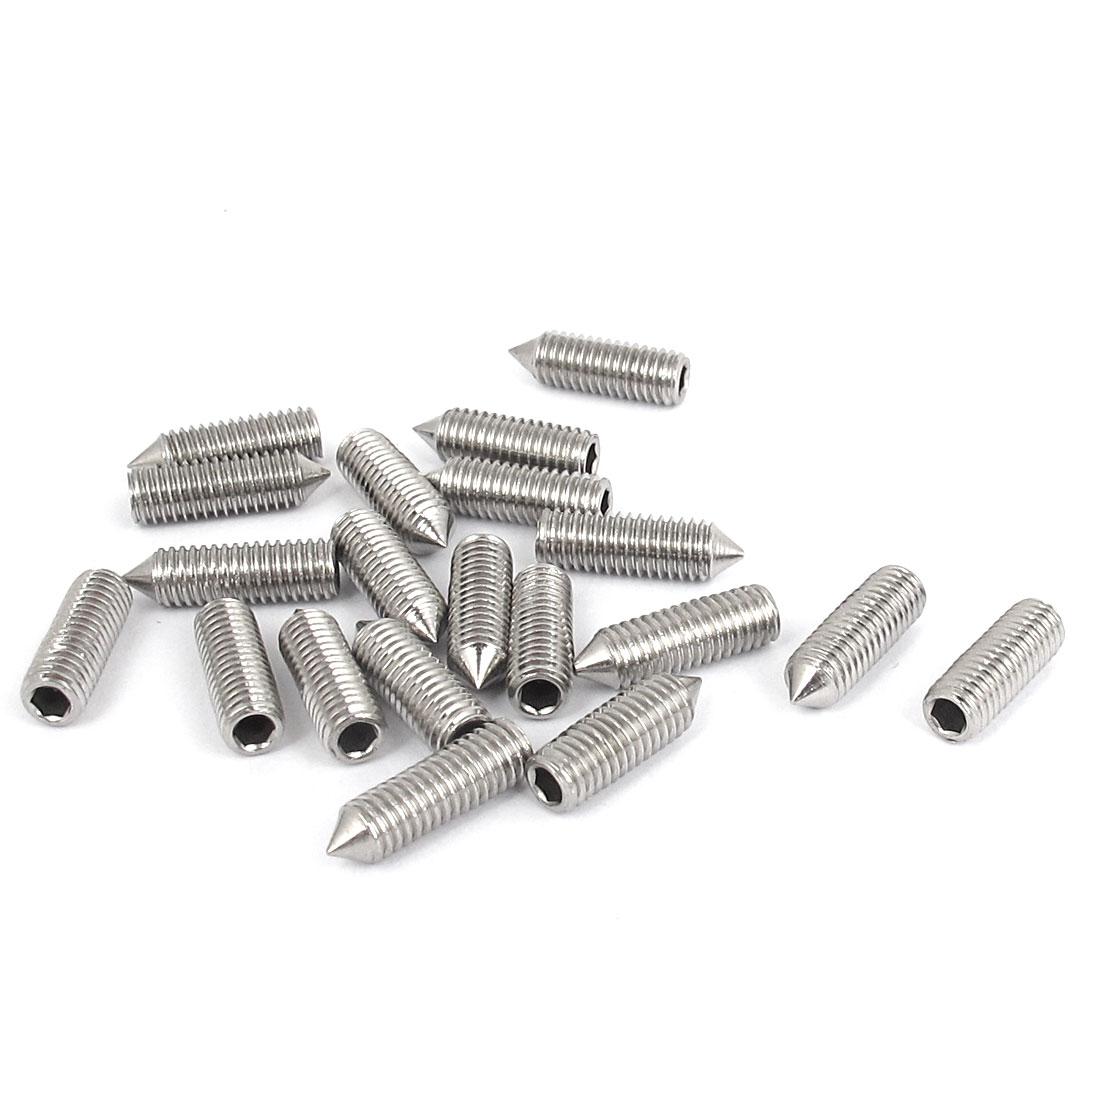 M5x16mm 304 Stainless Steel Cone Point Hexagon Socket Grub Screws 20pcs